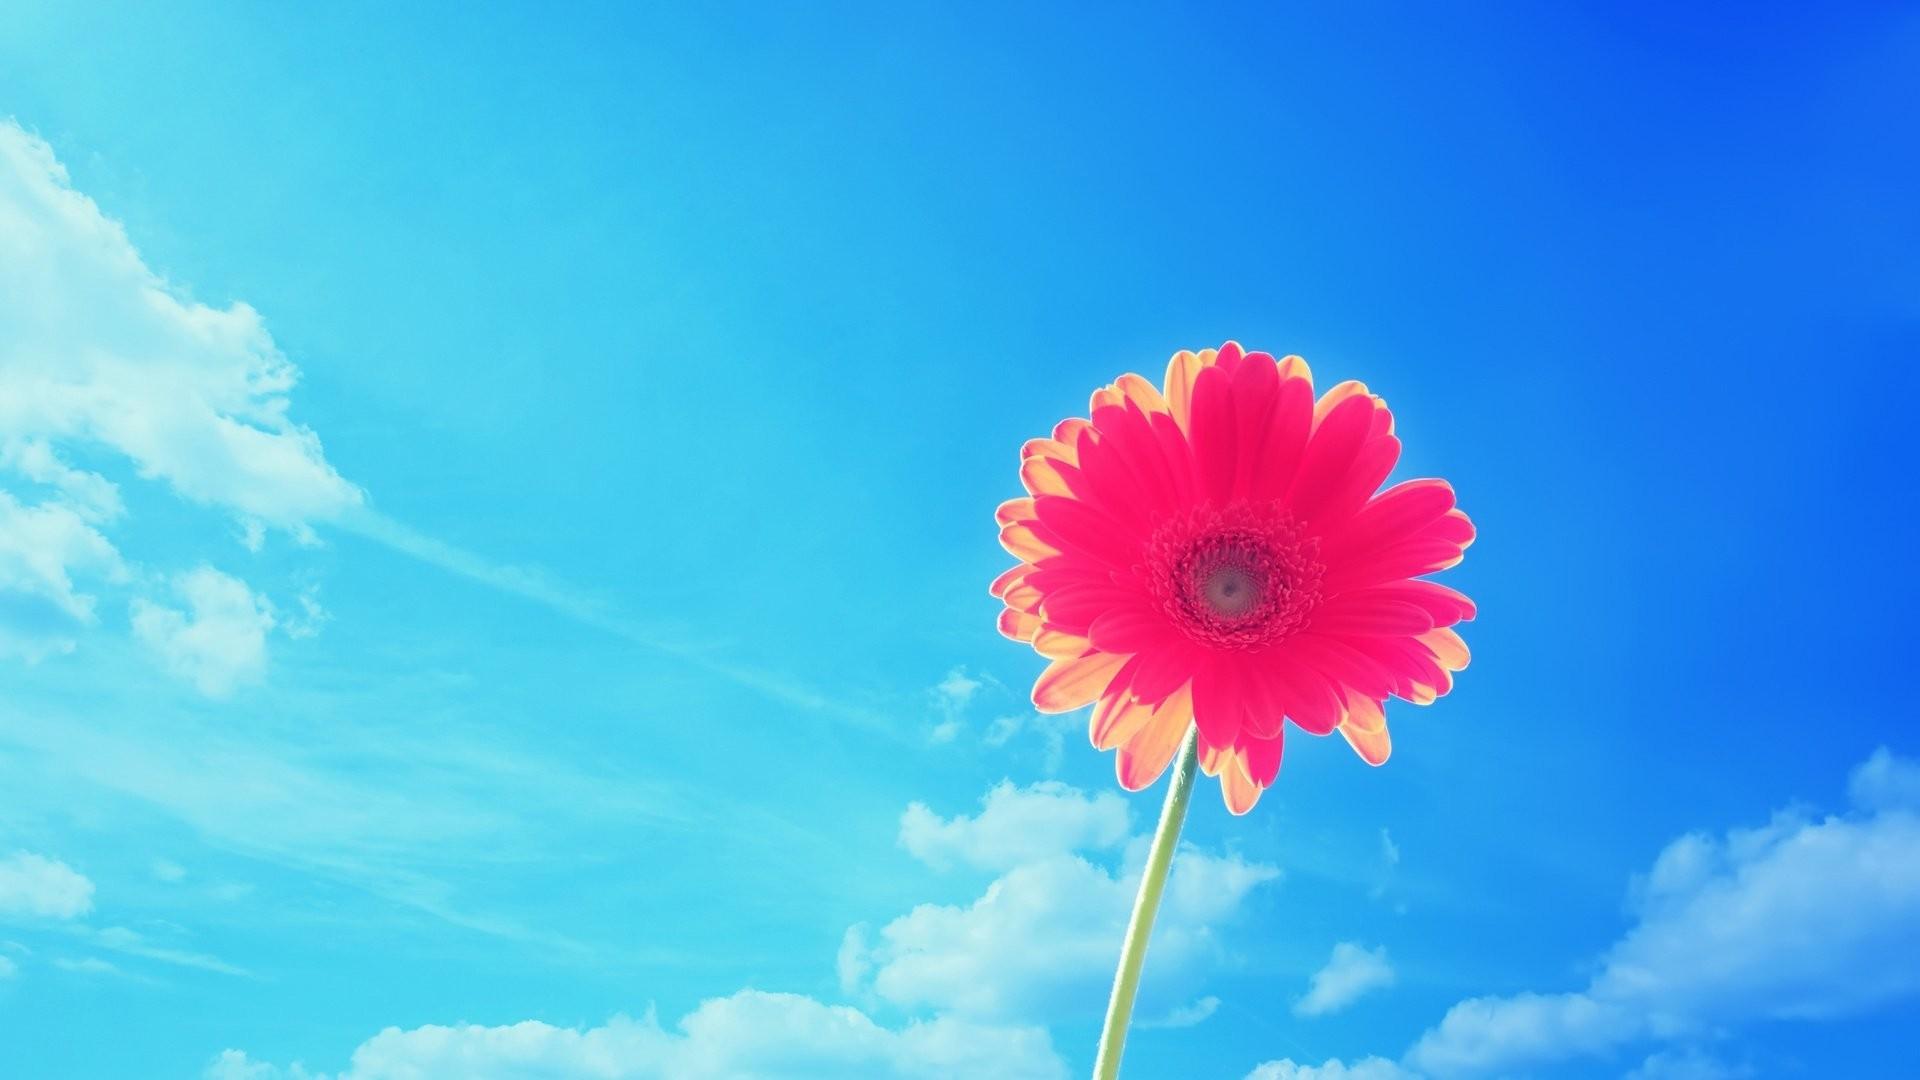 Pink Summer Desktop Wallpaper Simple Decoration Flower Motive Ideas  Personalized Sample Themes